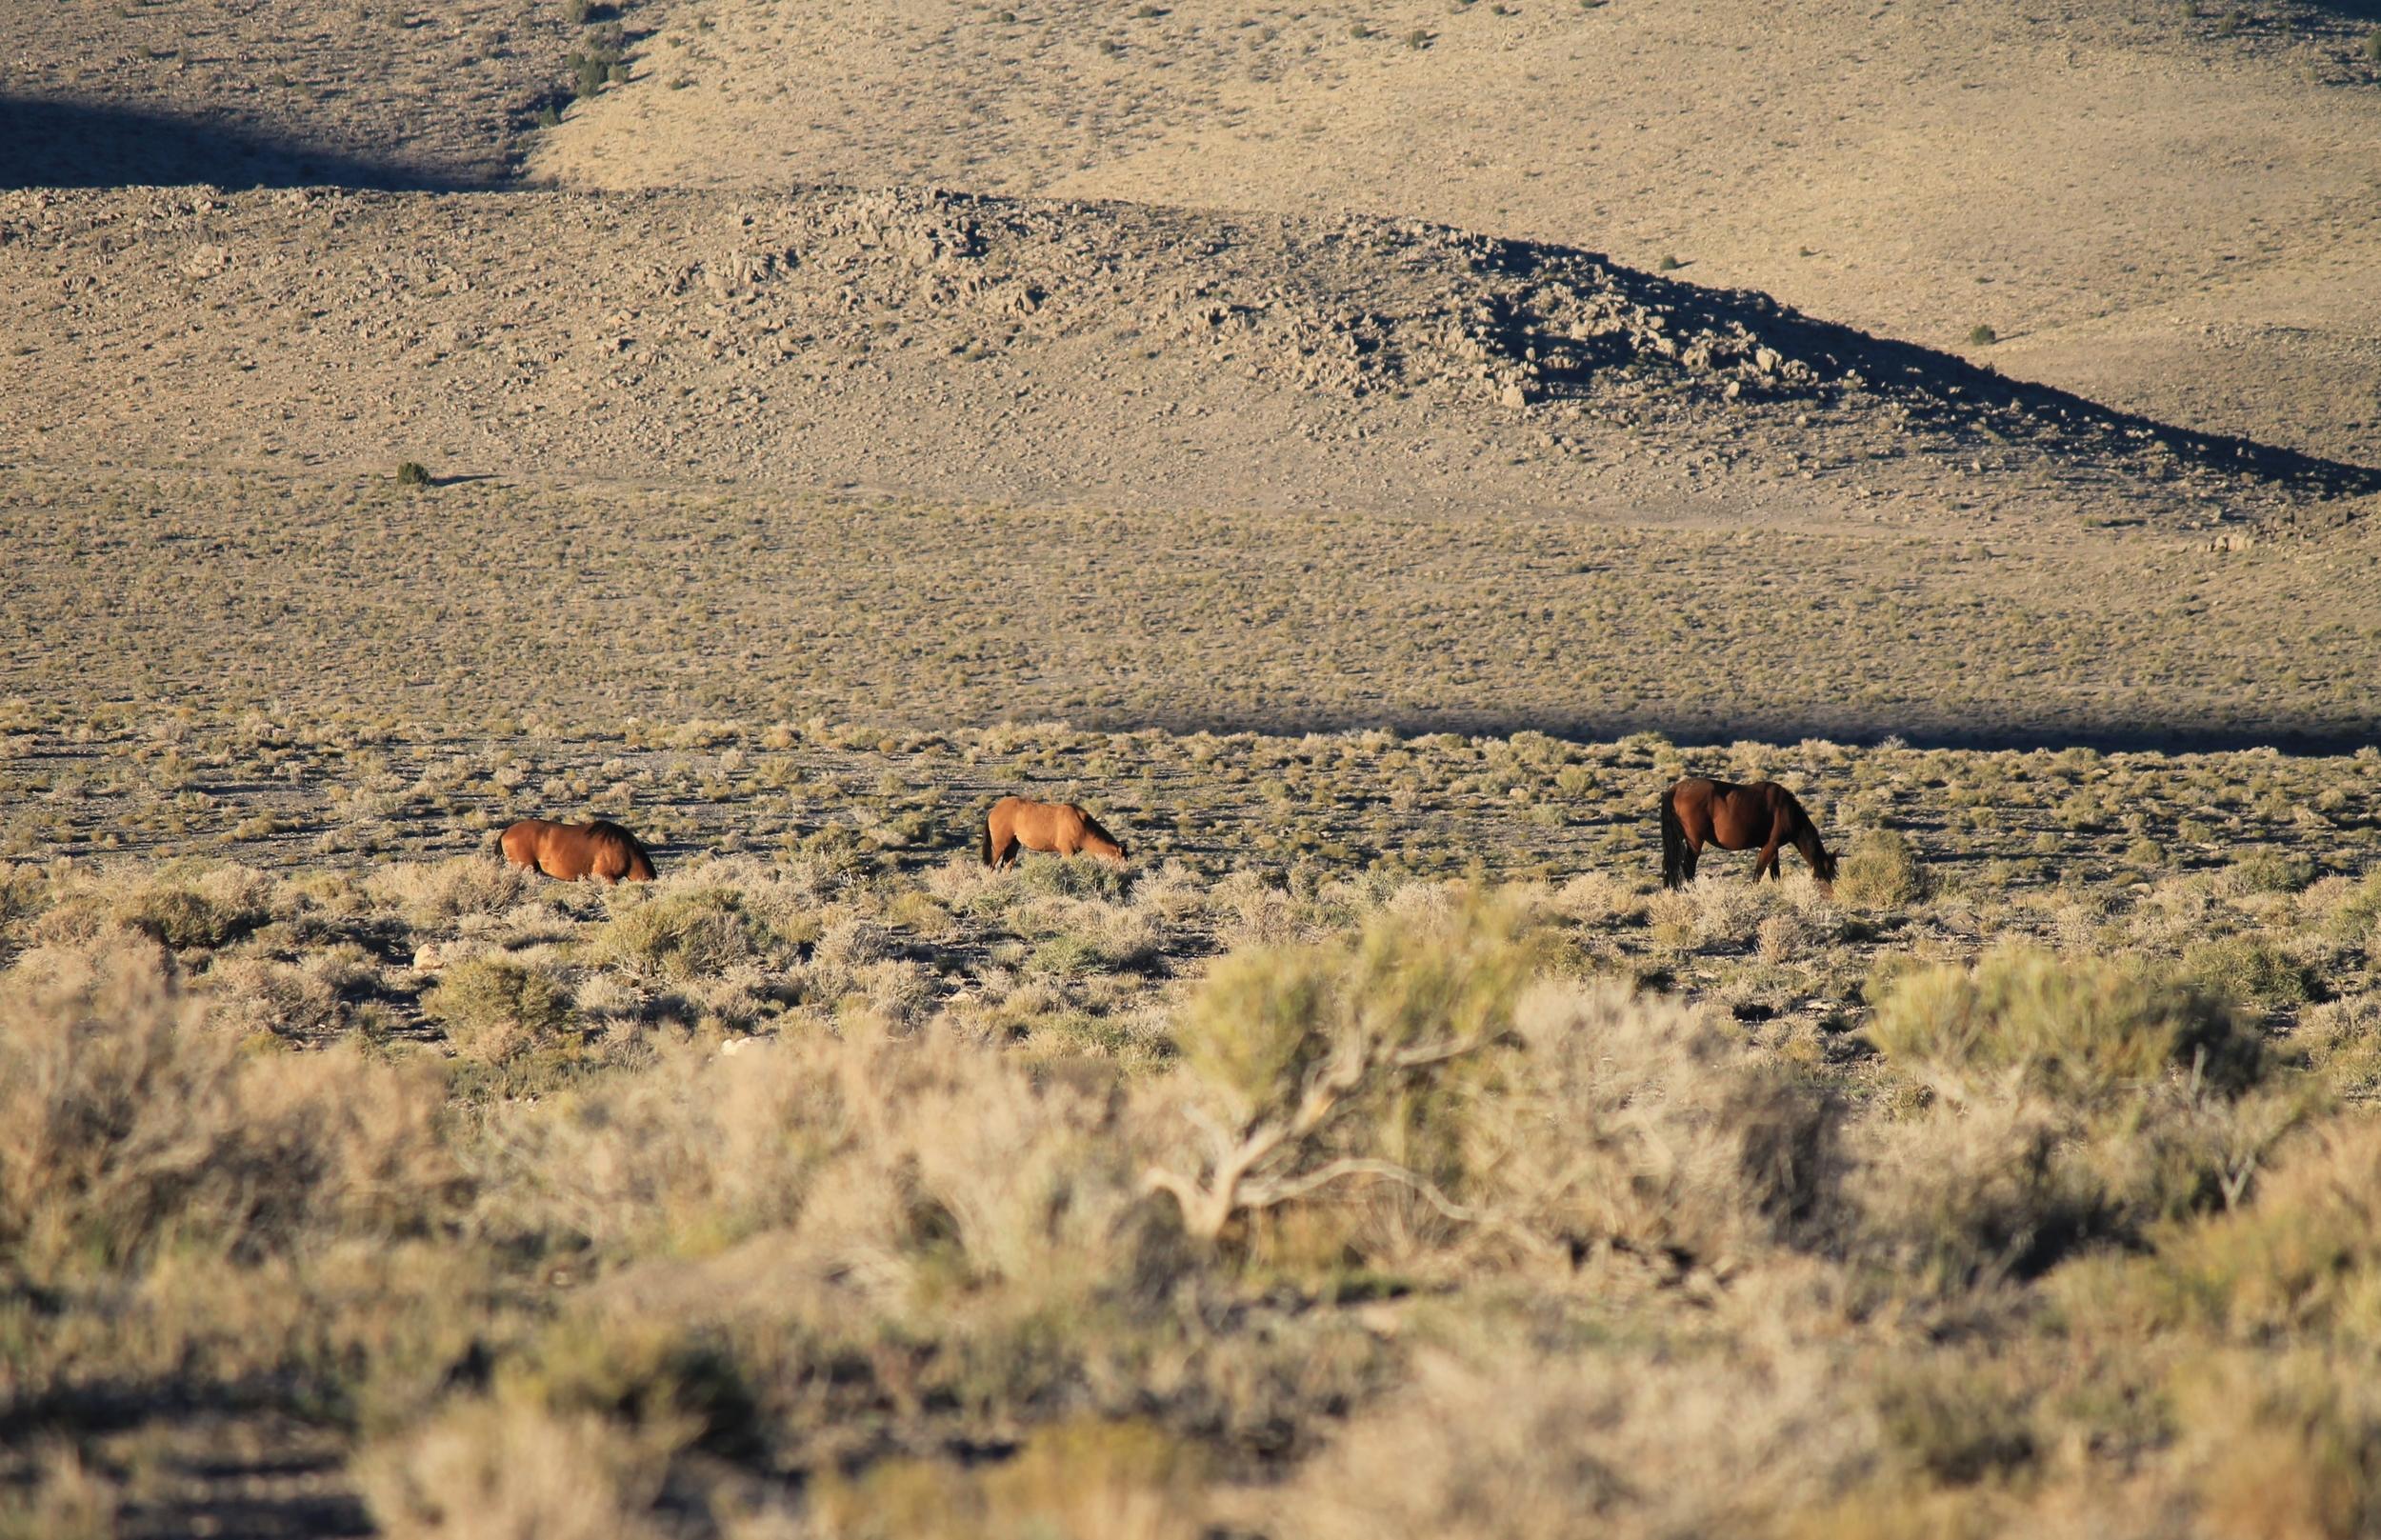 Grazing near Antelope Spring